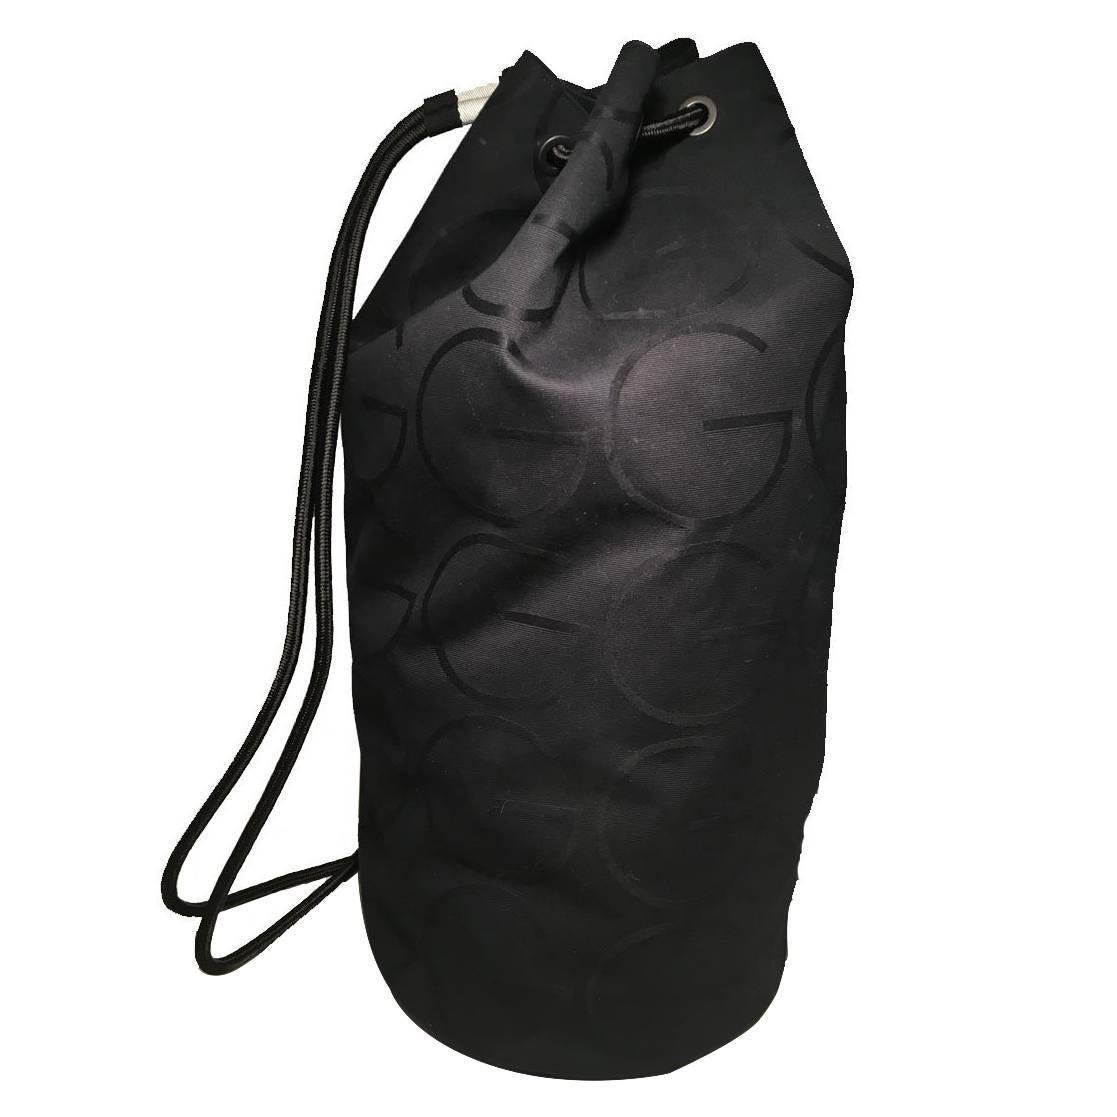 RARE Gucci Black GG Monogram Canvas Sling Backpack Bag